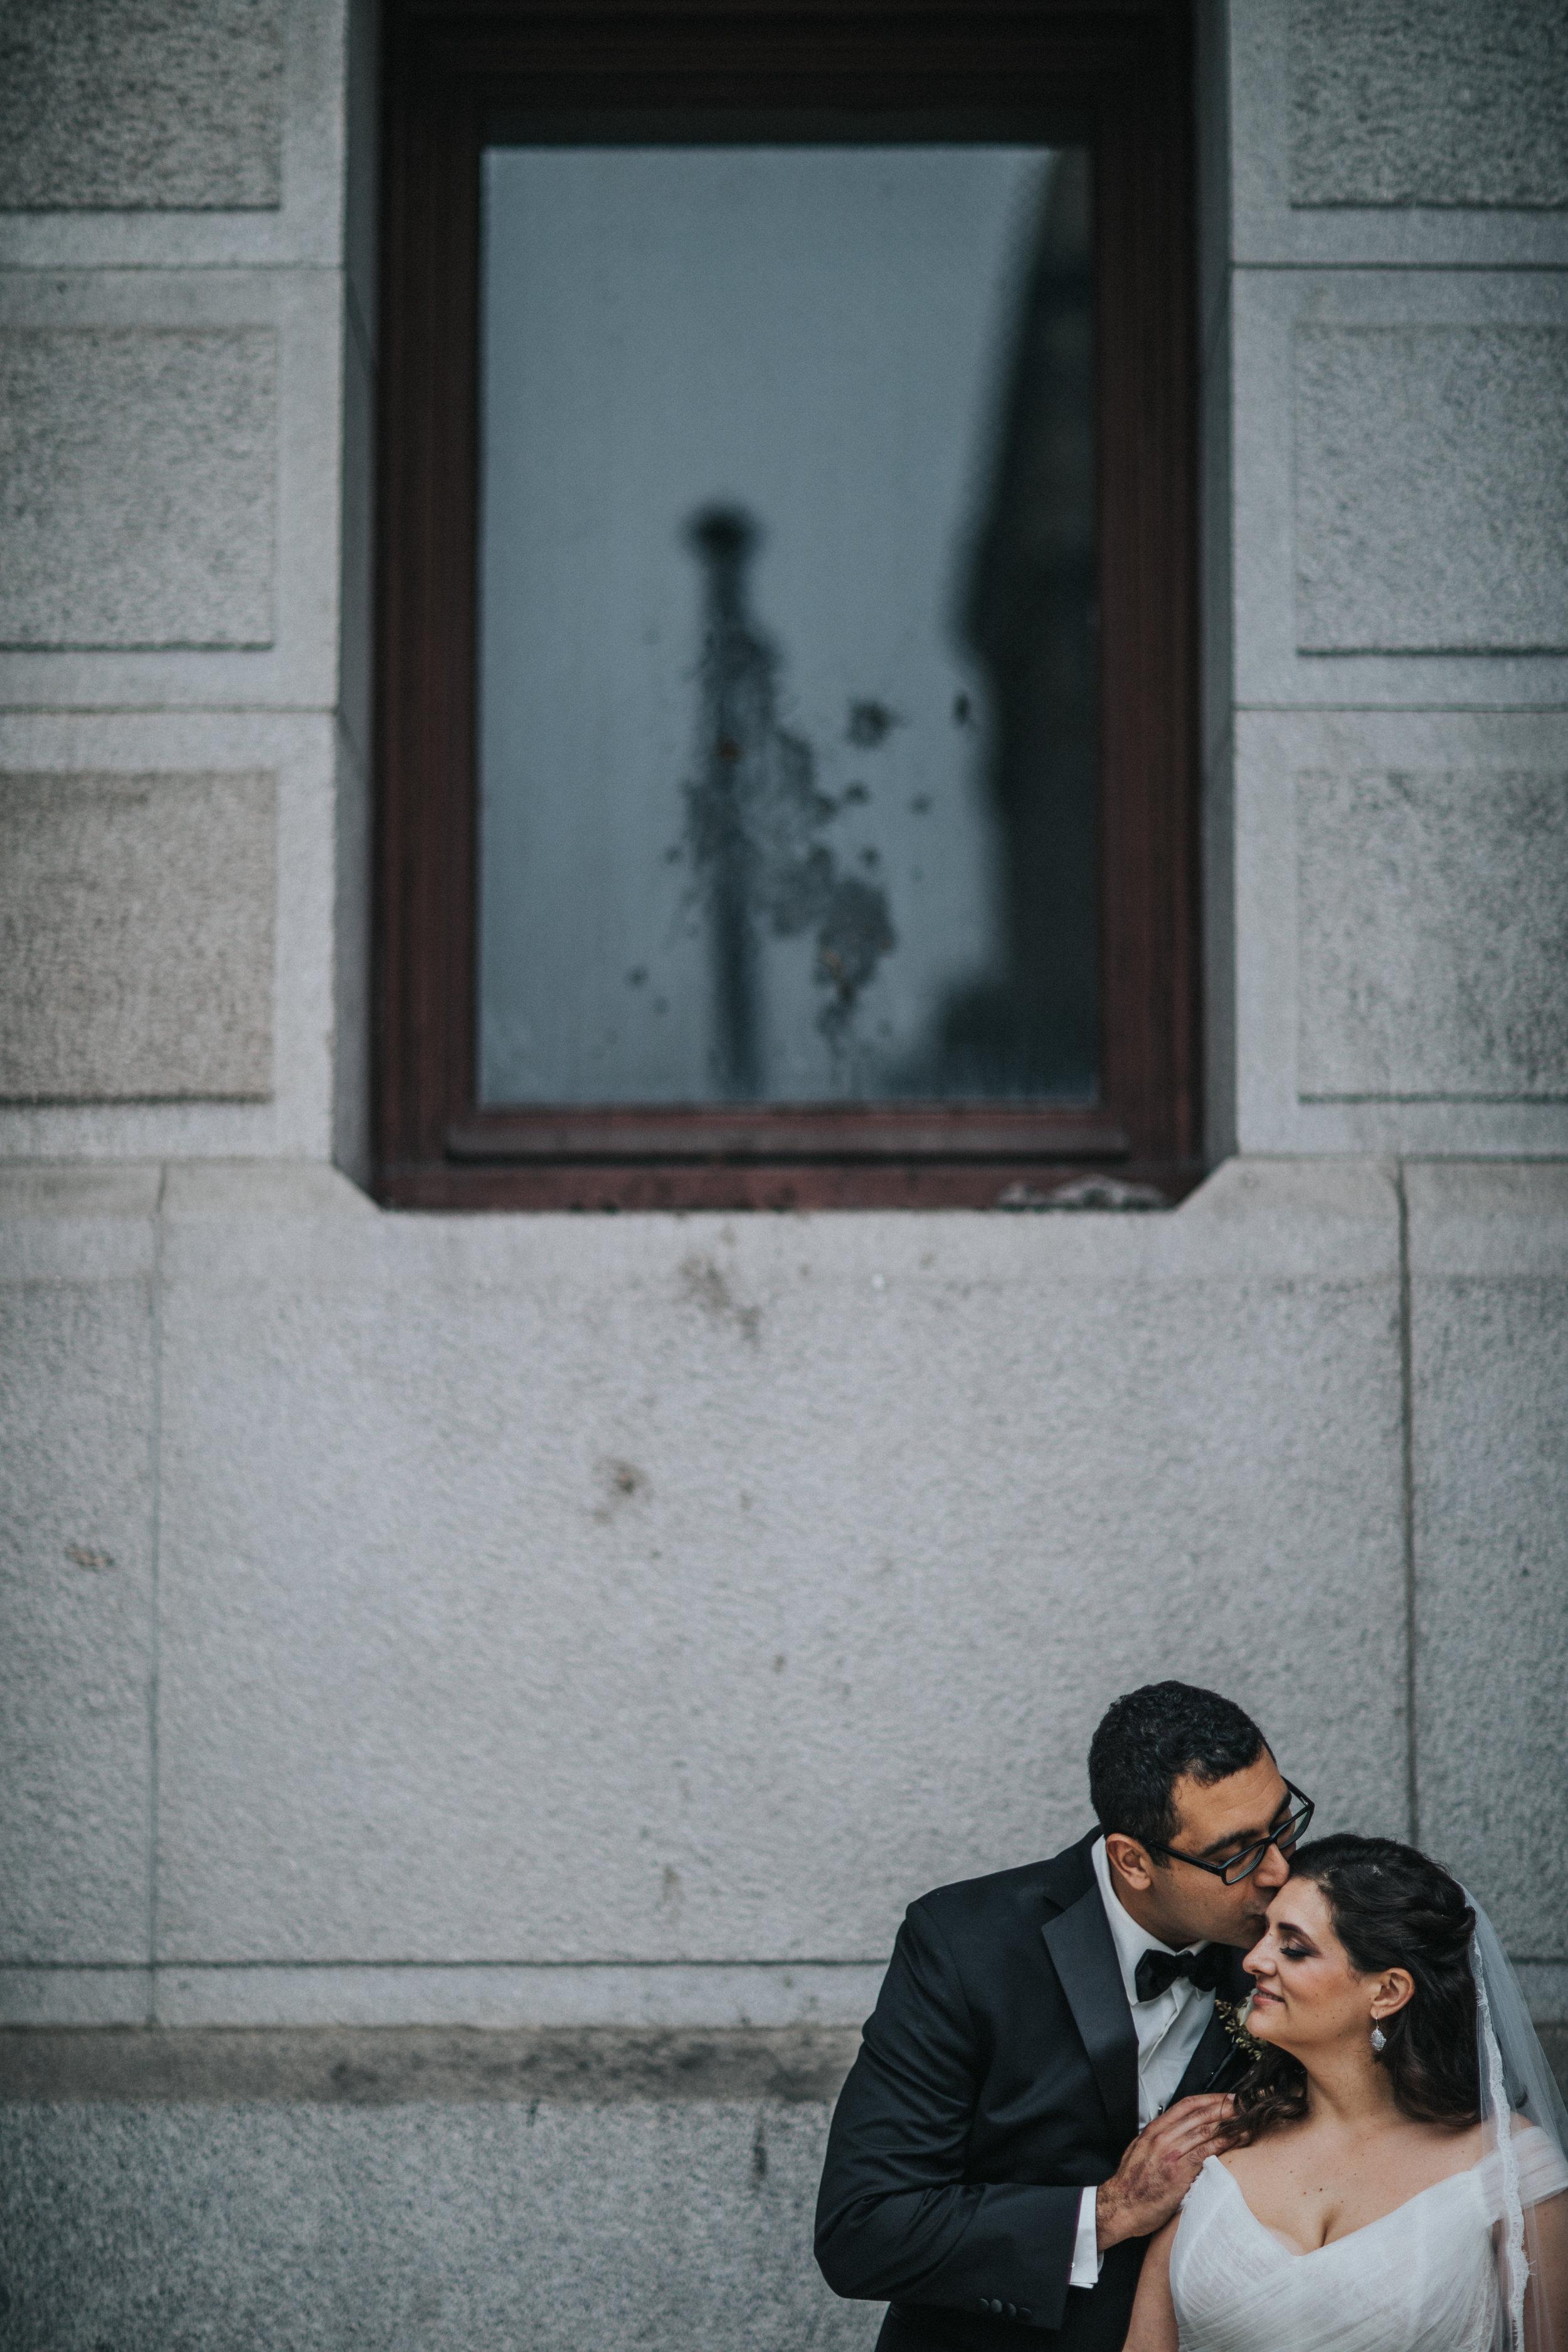 JennaLynnPhotography-NJWeddingPhotographer-Philadelphia-Wedding-ArtsBallroom-BridalParty-44.jpg